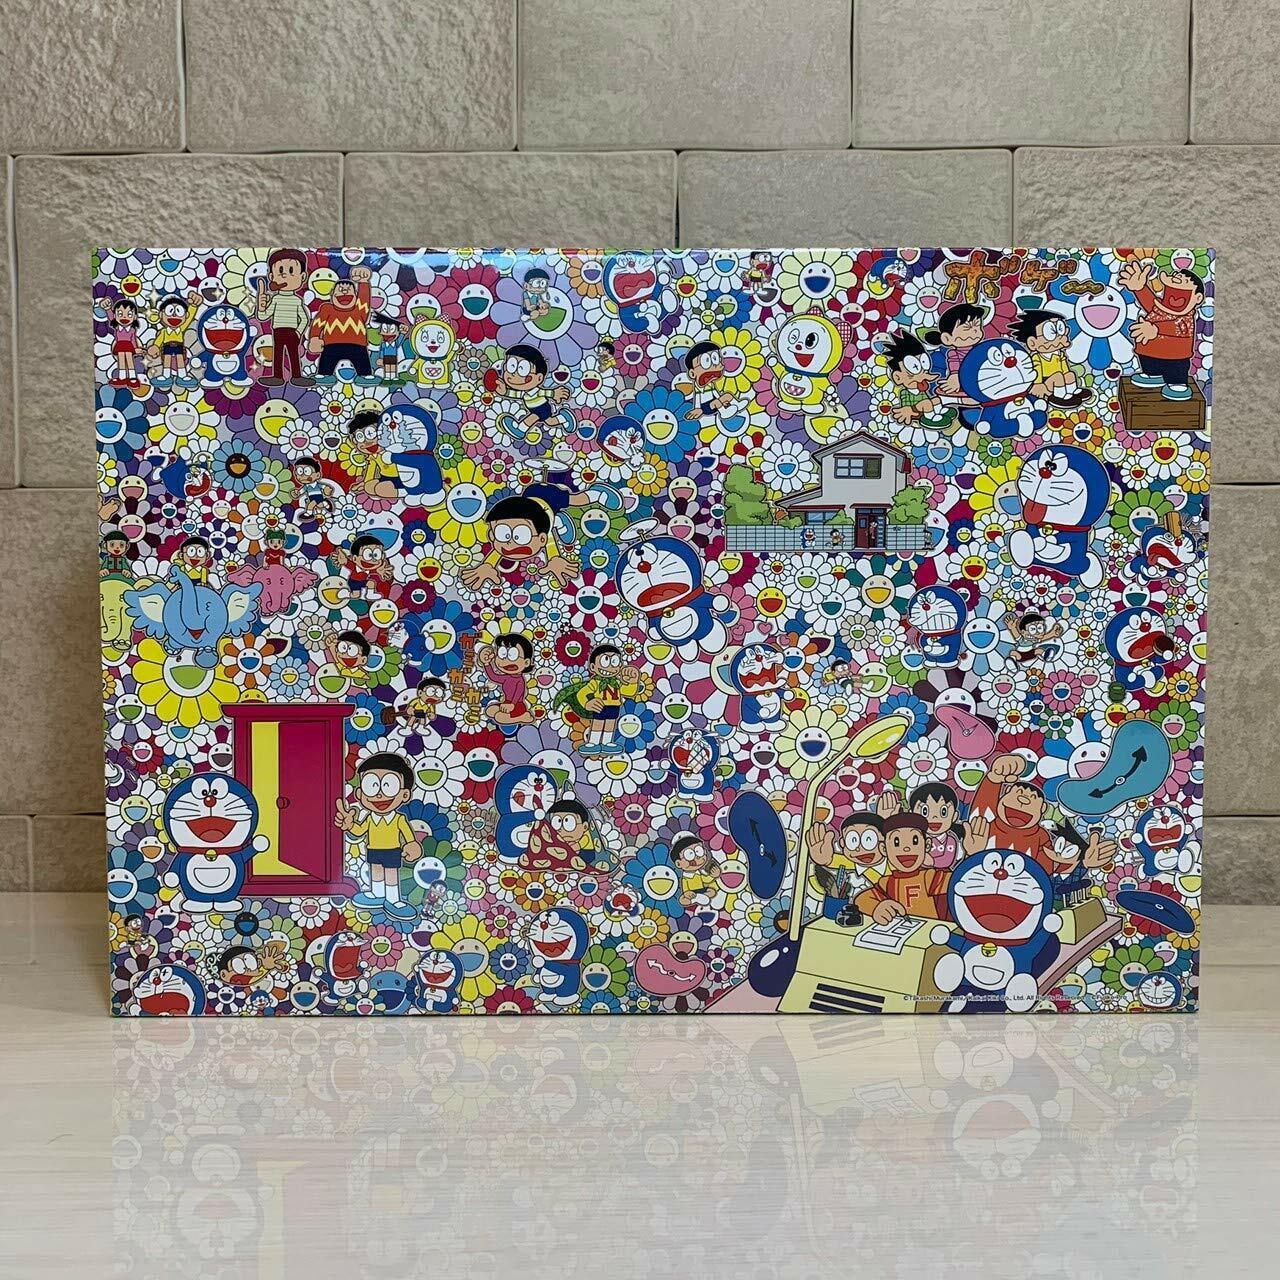 2017 Doraemon Takashi Murakami Jigsaw  Puzzle 1000pcs du Japon  magasin pas cher